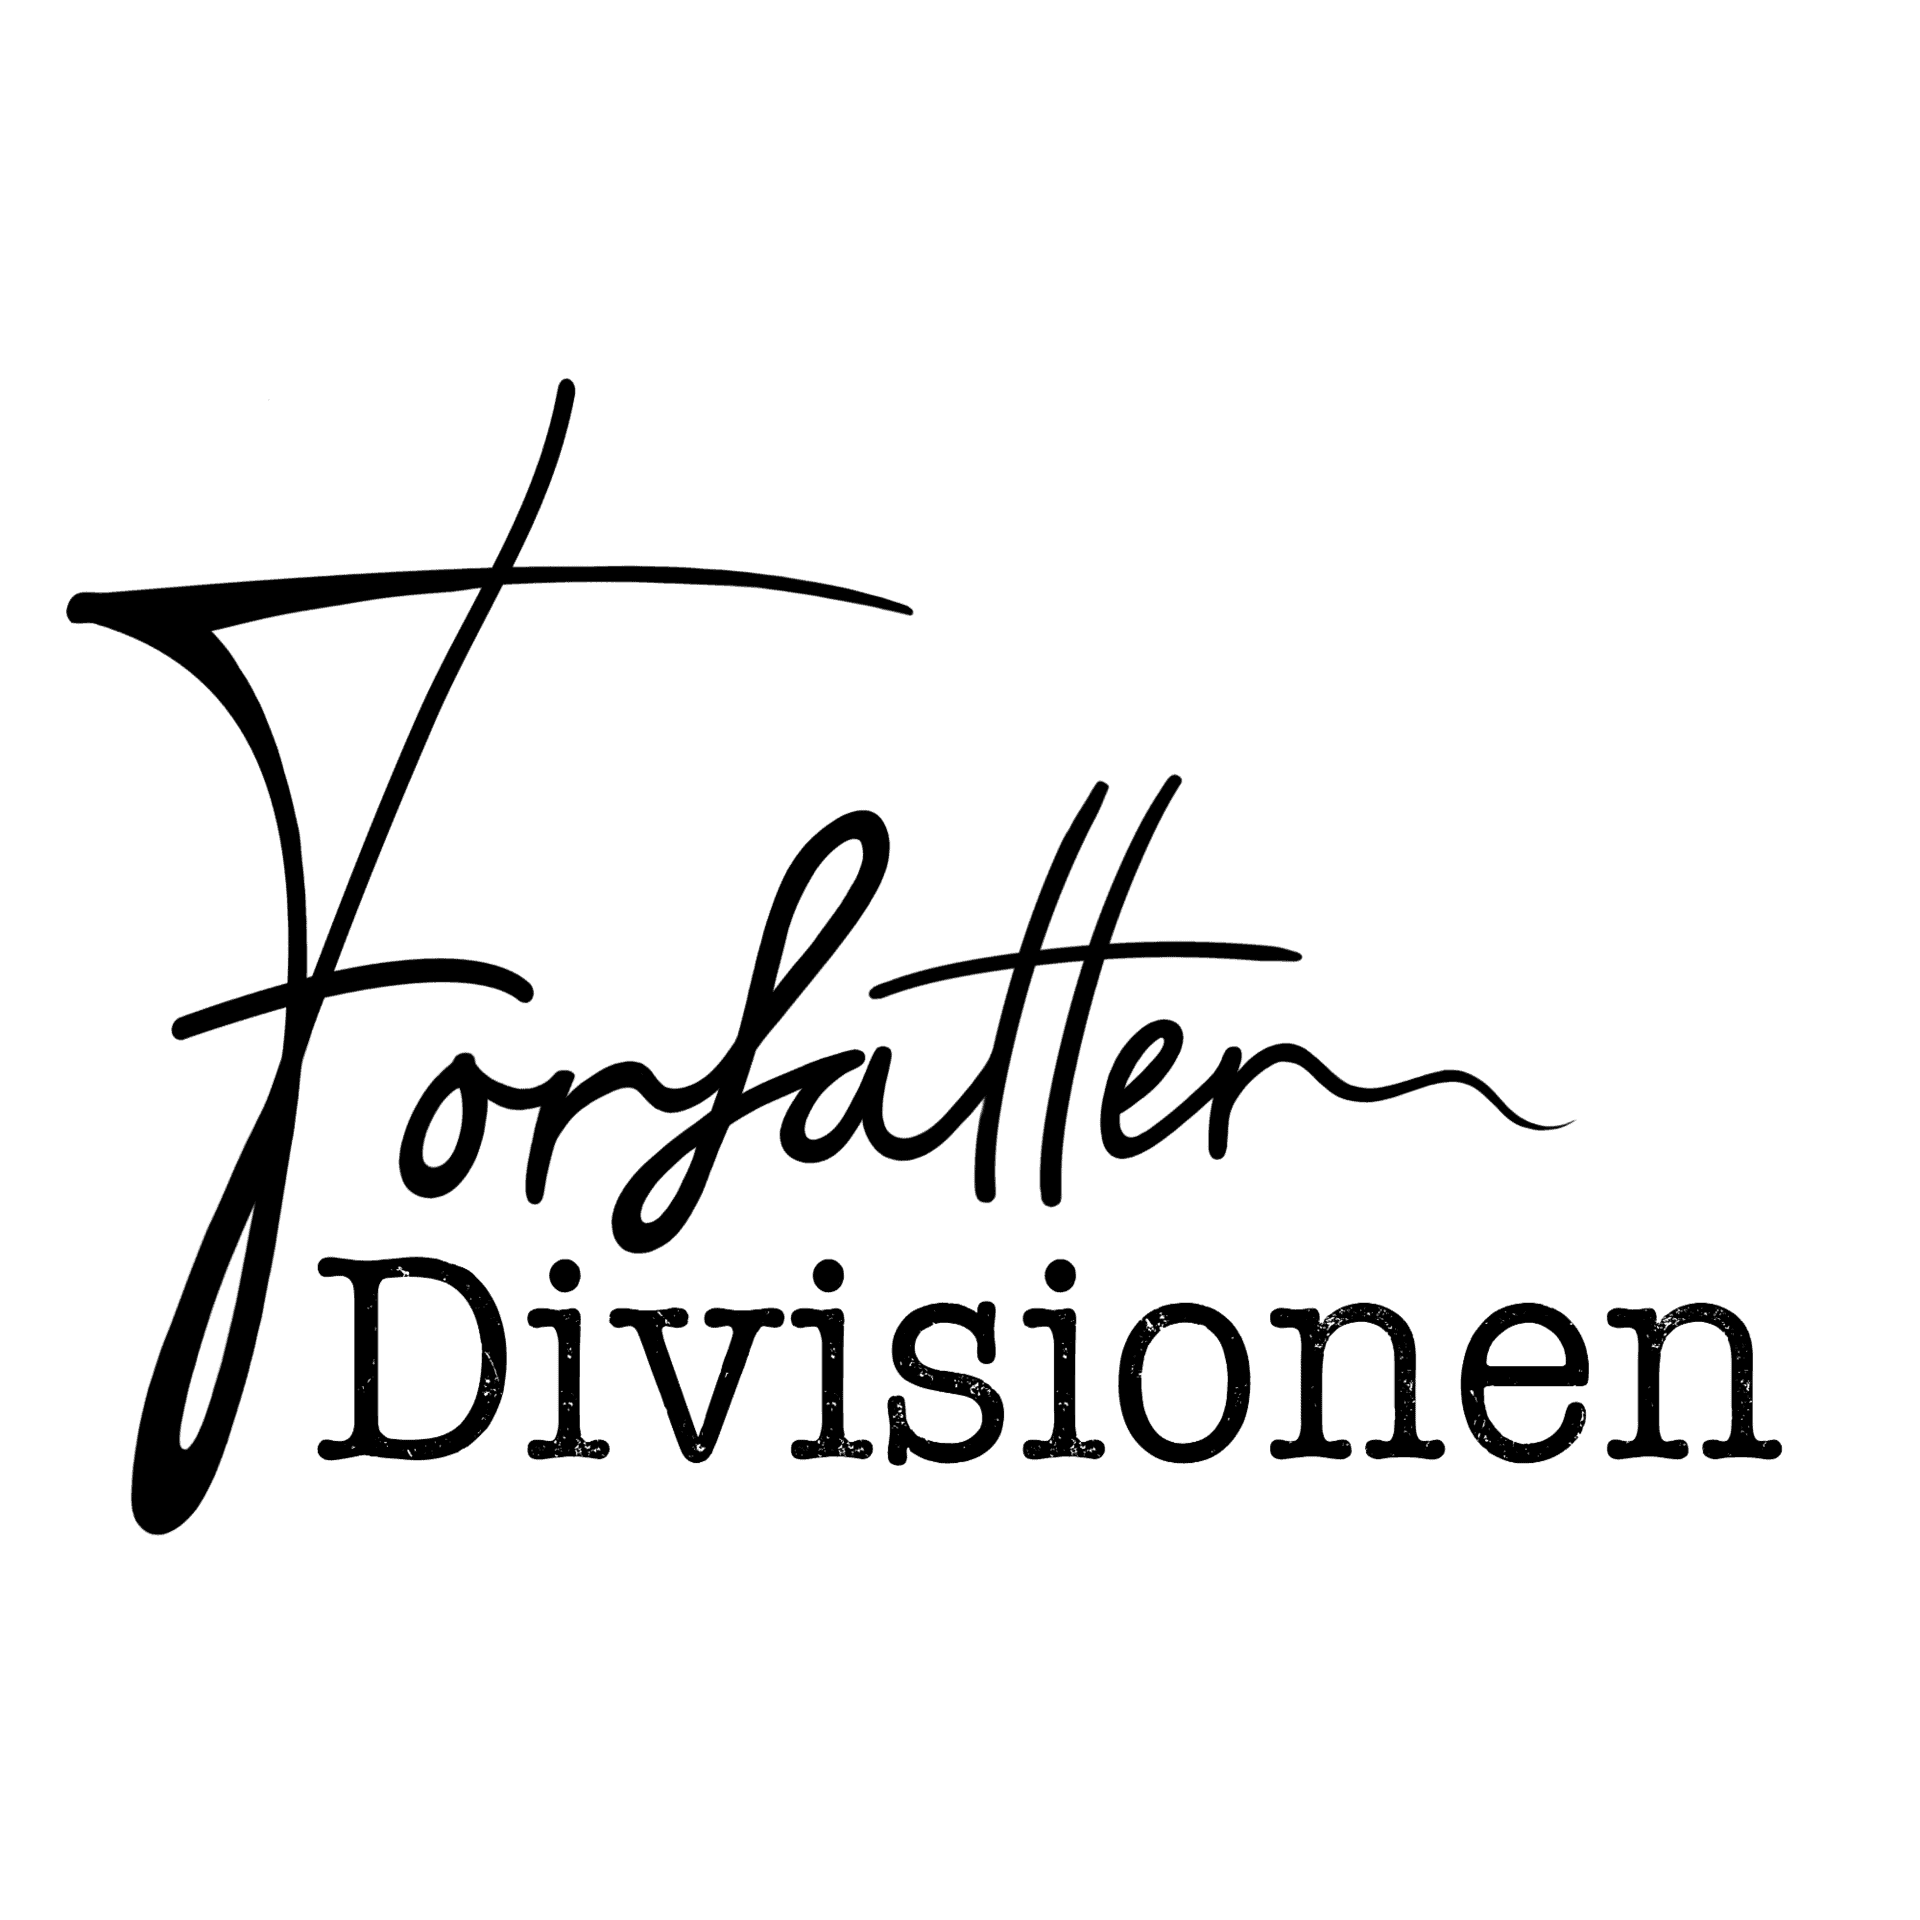 Forfatter Divisionen